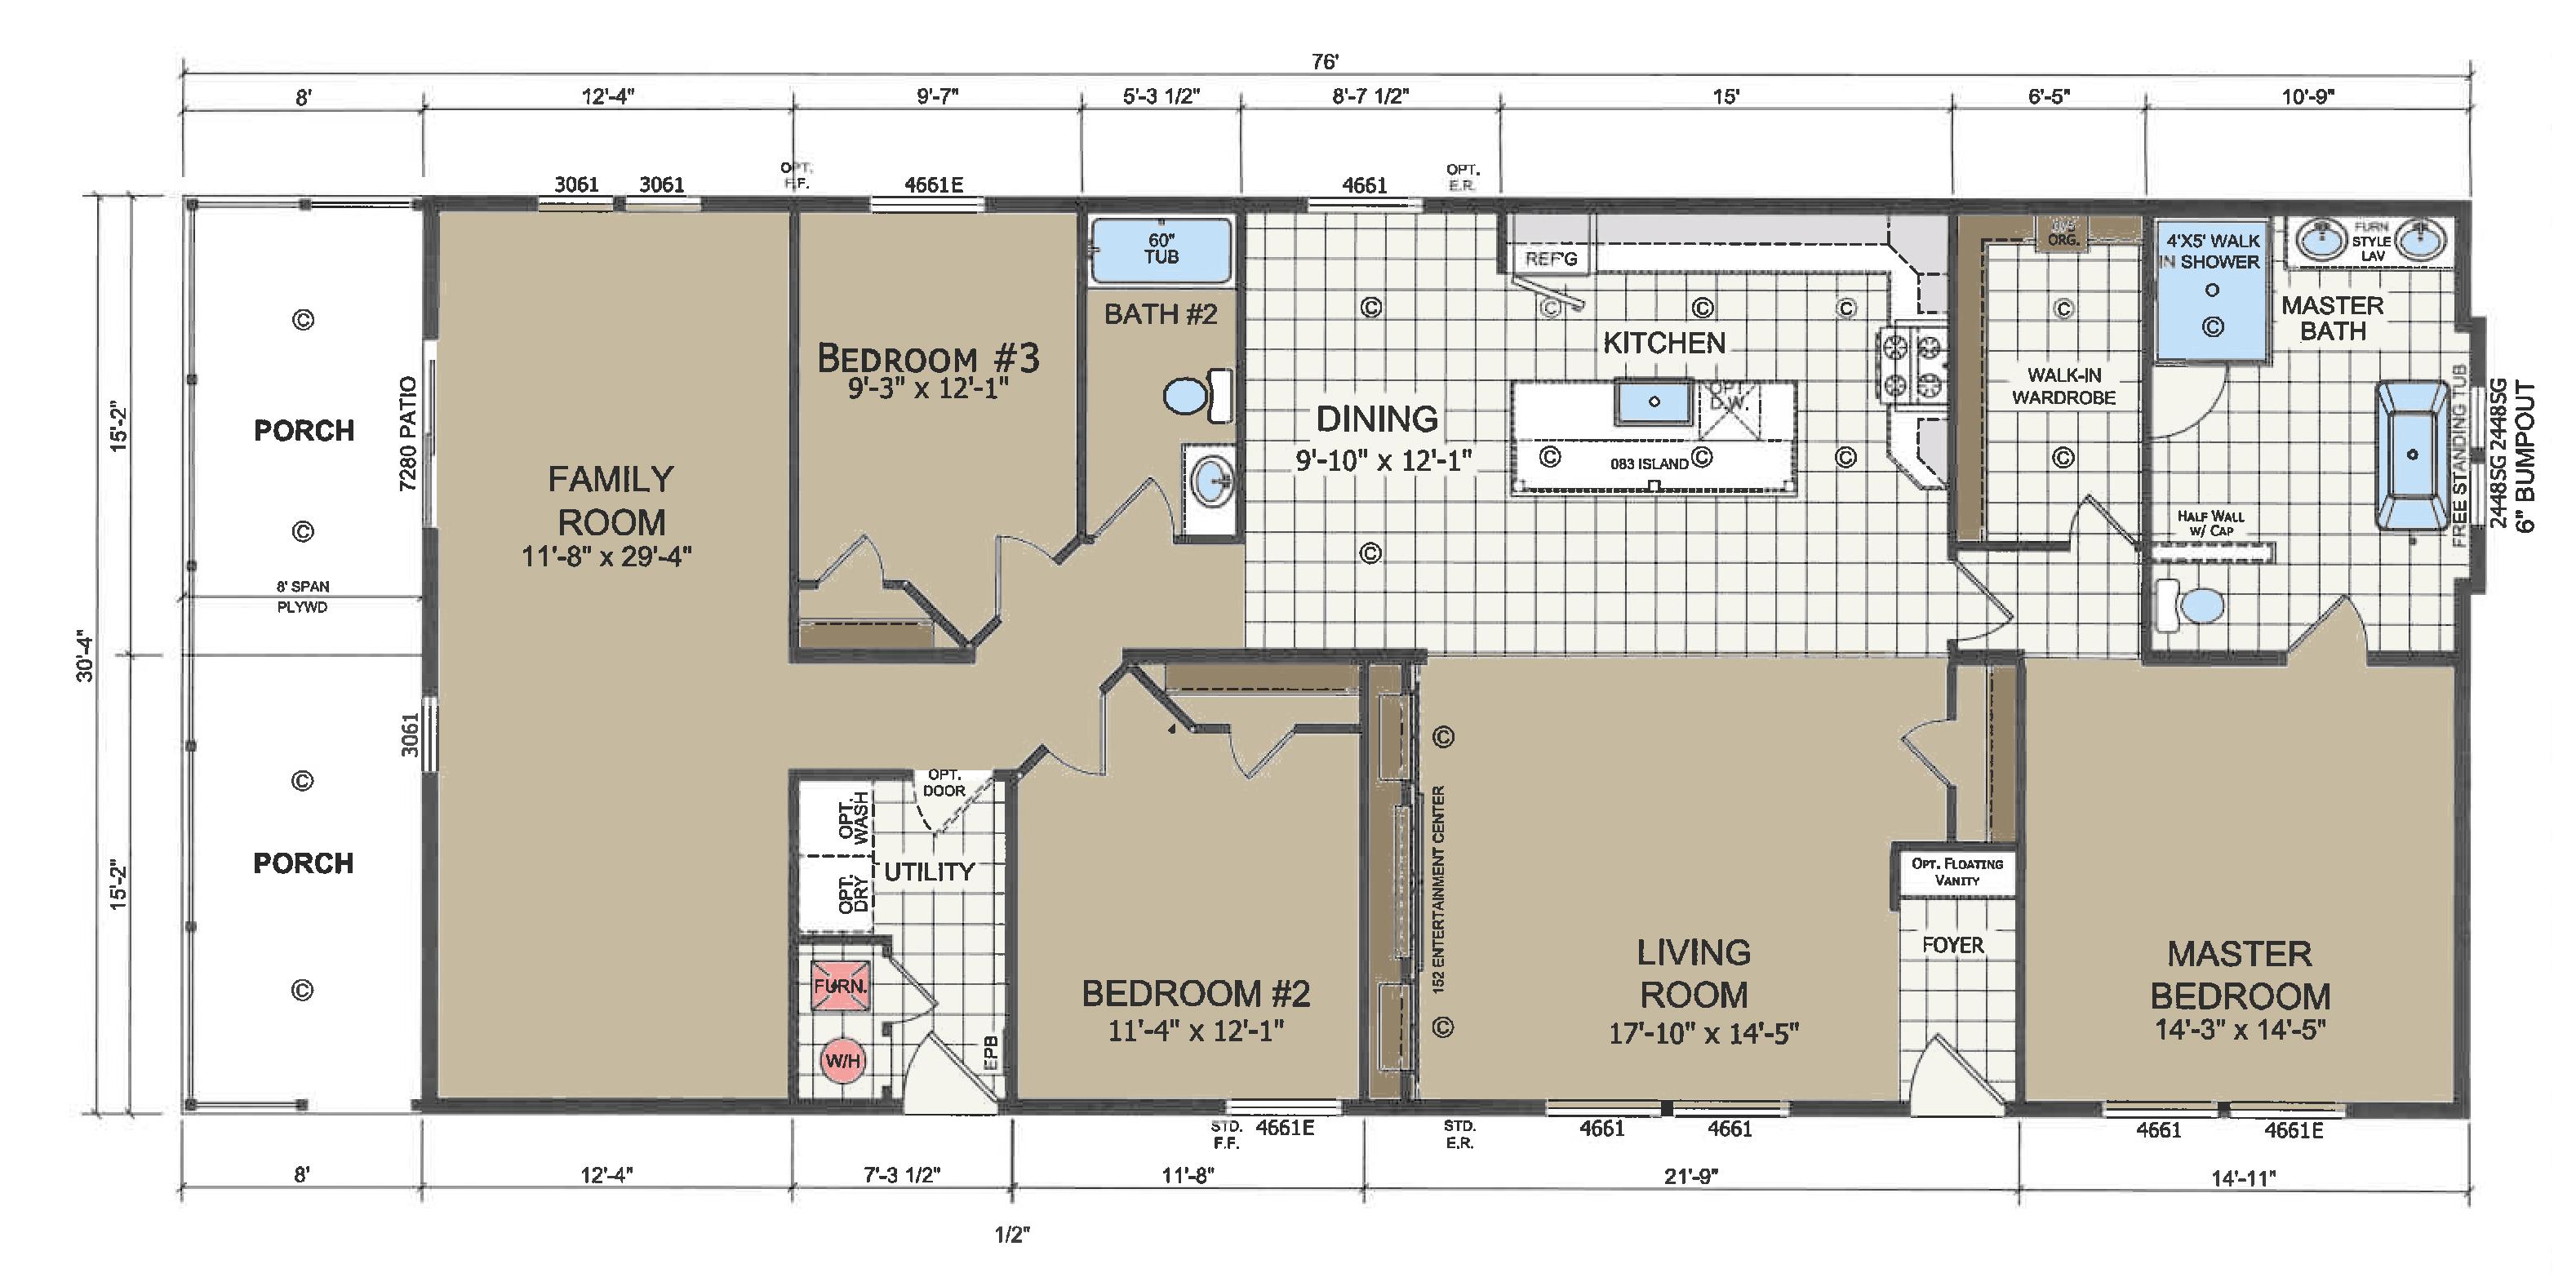 floorplan image for unit 346